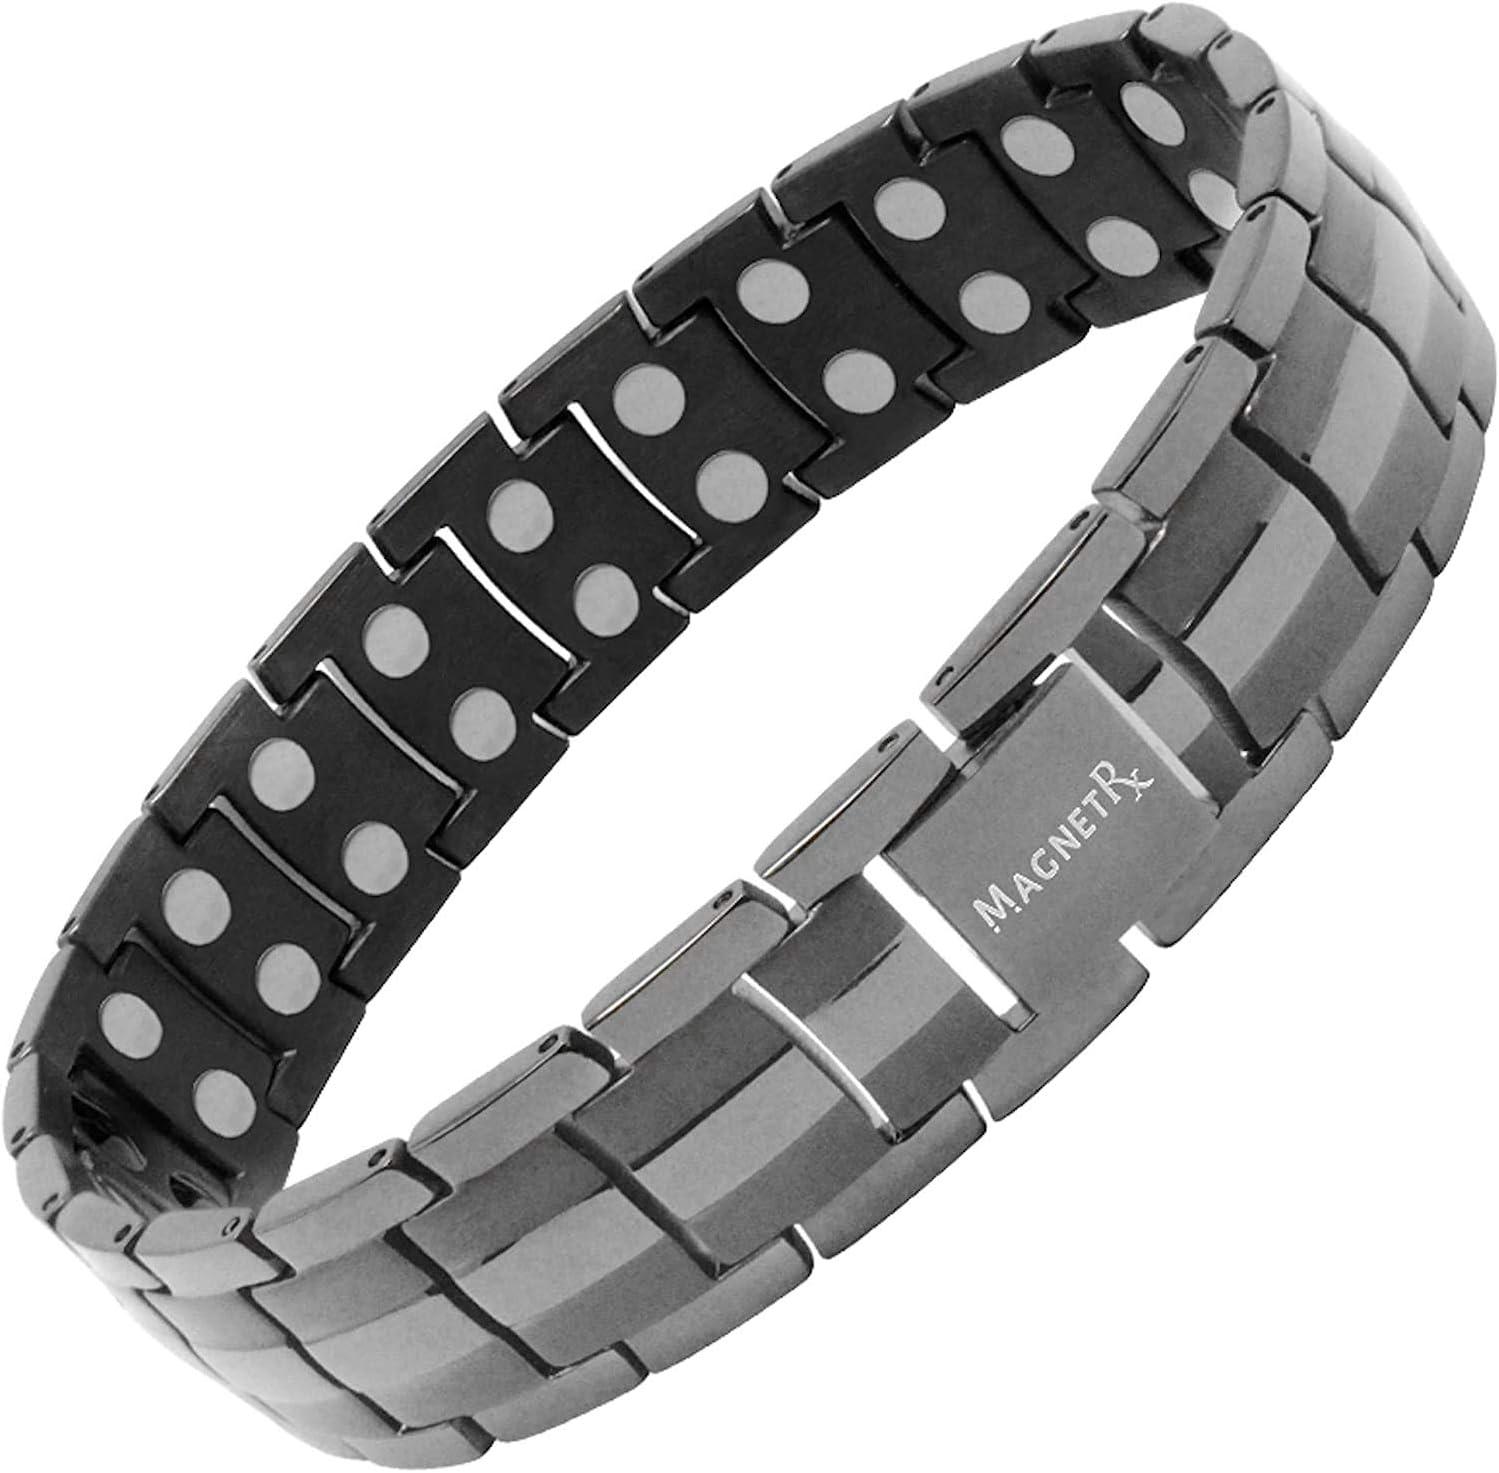 MagnetRX Ultra Strong Magnetic Therapy Bracelet   Arthritis Pain Relief and Carpal Tunnel Magnetic Bracelets for Men   adjustable with gift box, Adjustable Men's Bracelet, Black